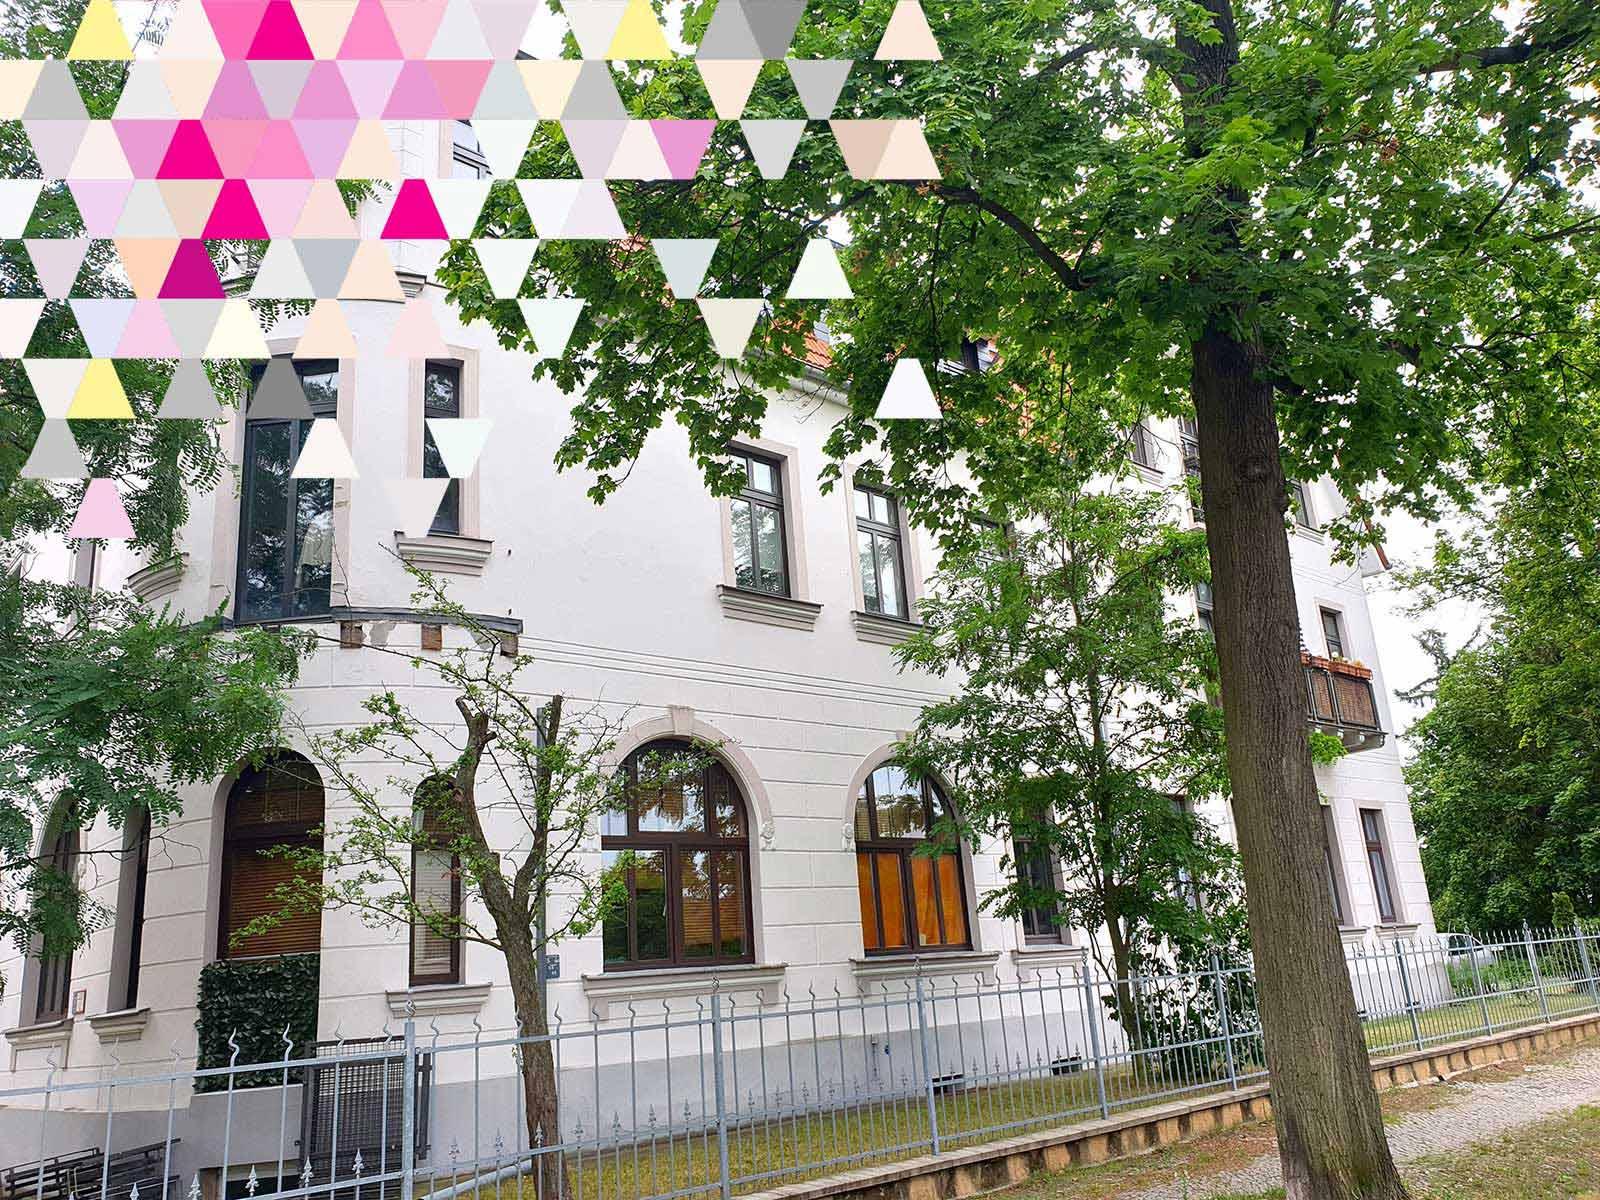 Referenz: Eigentumswohnung in Berlin Mahlsdorf